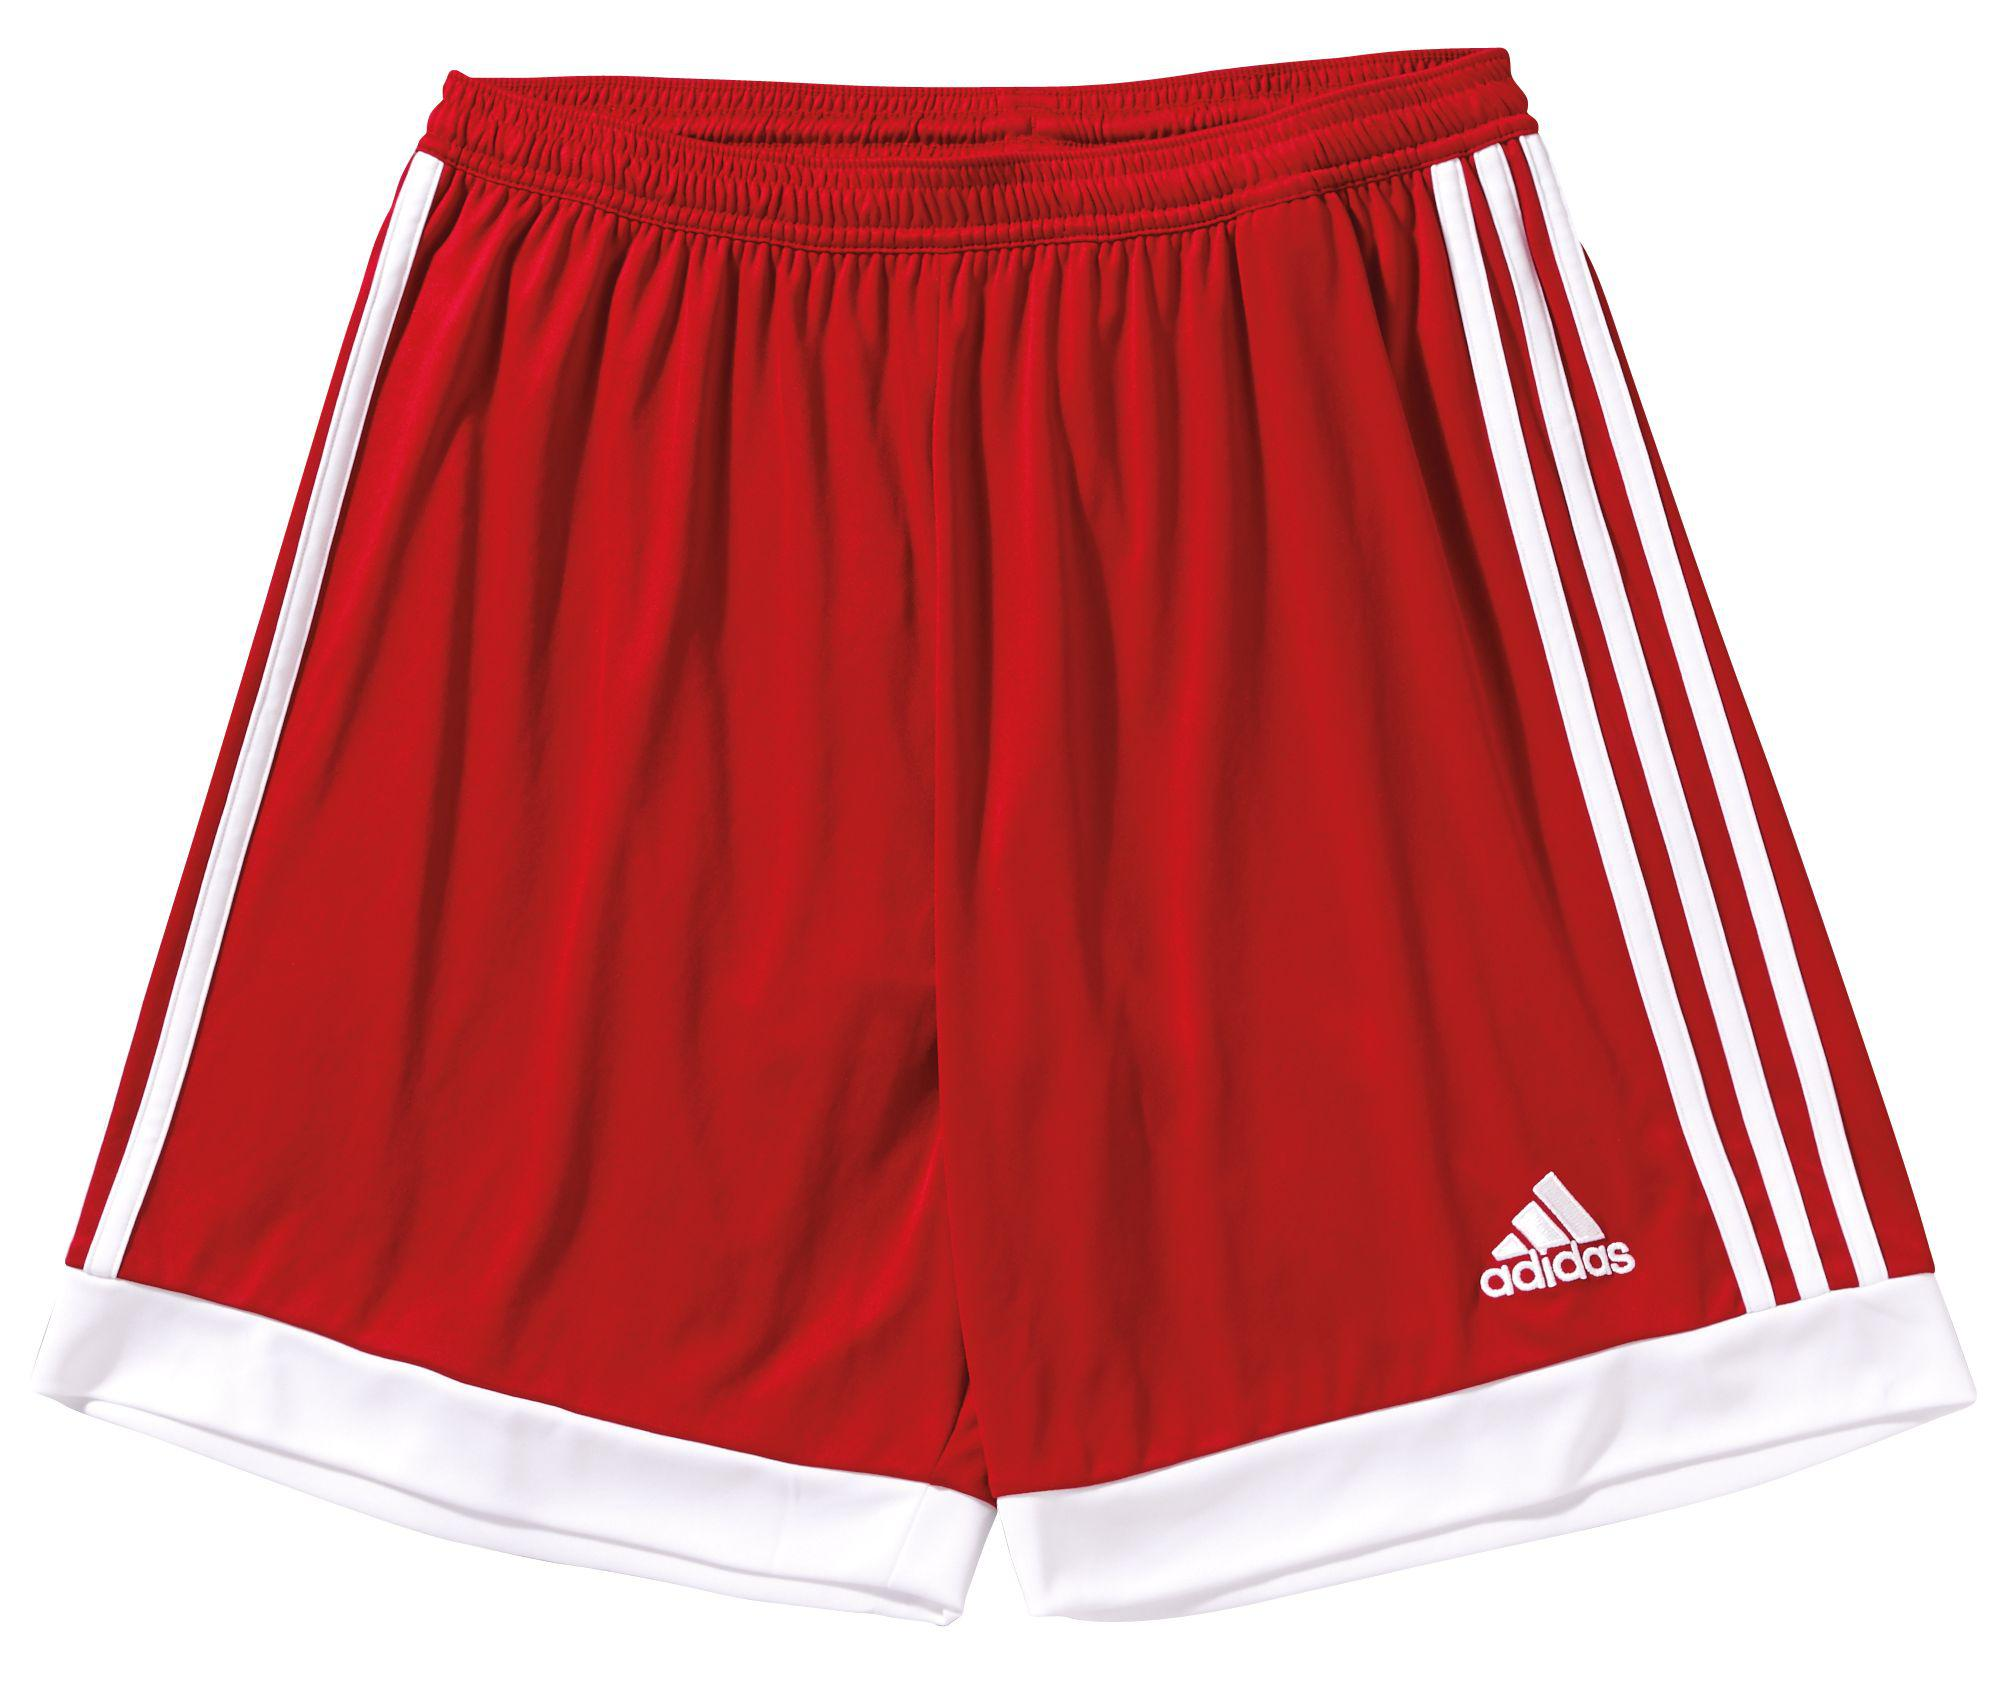 5a850f37c7b Lyst - adidas Tastigo 15 Knit Soccer Shorts in Red for Men